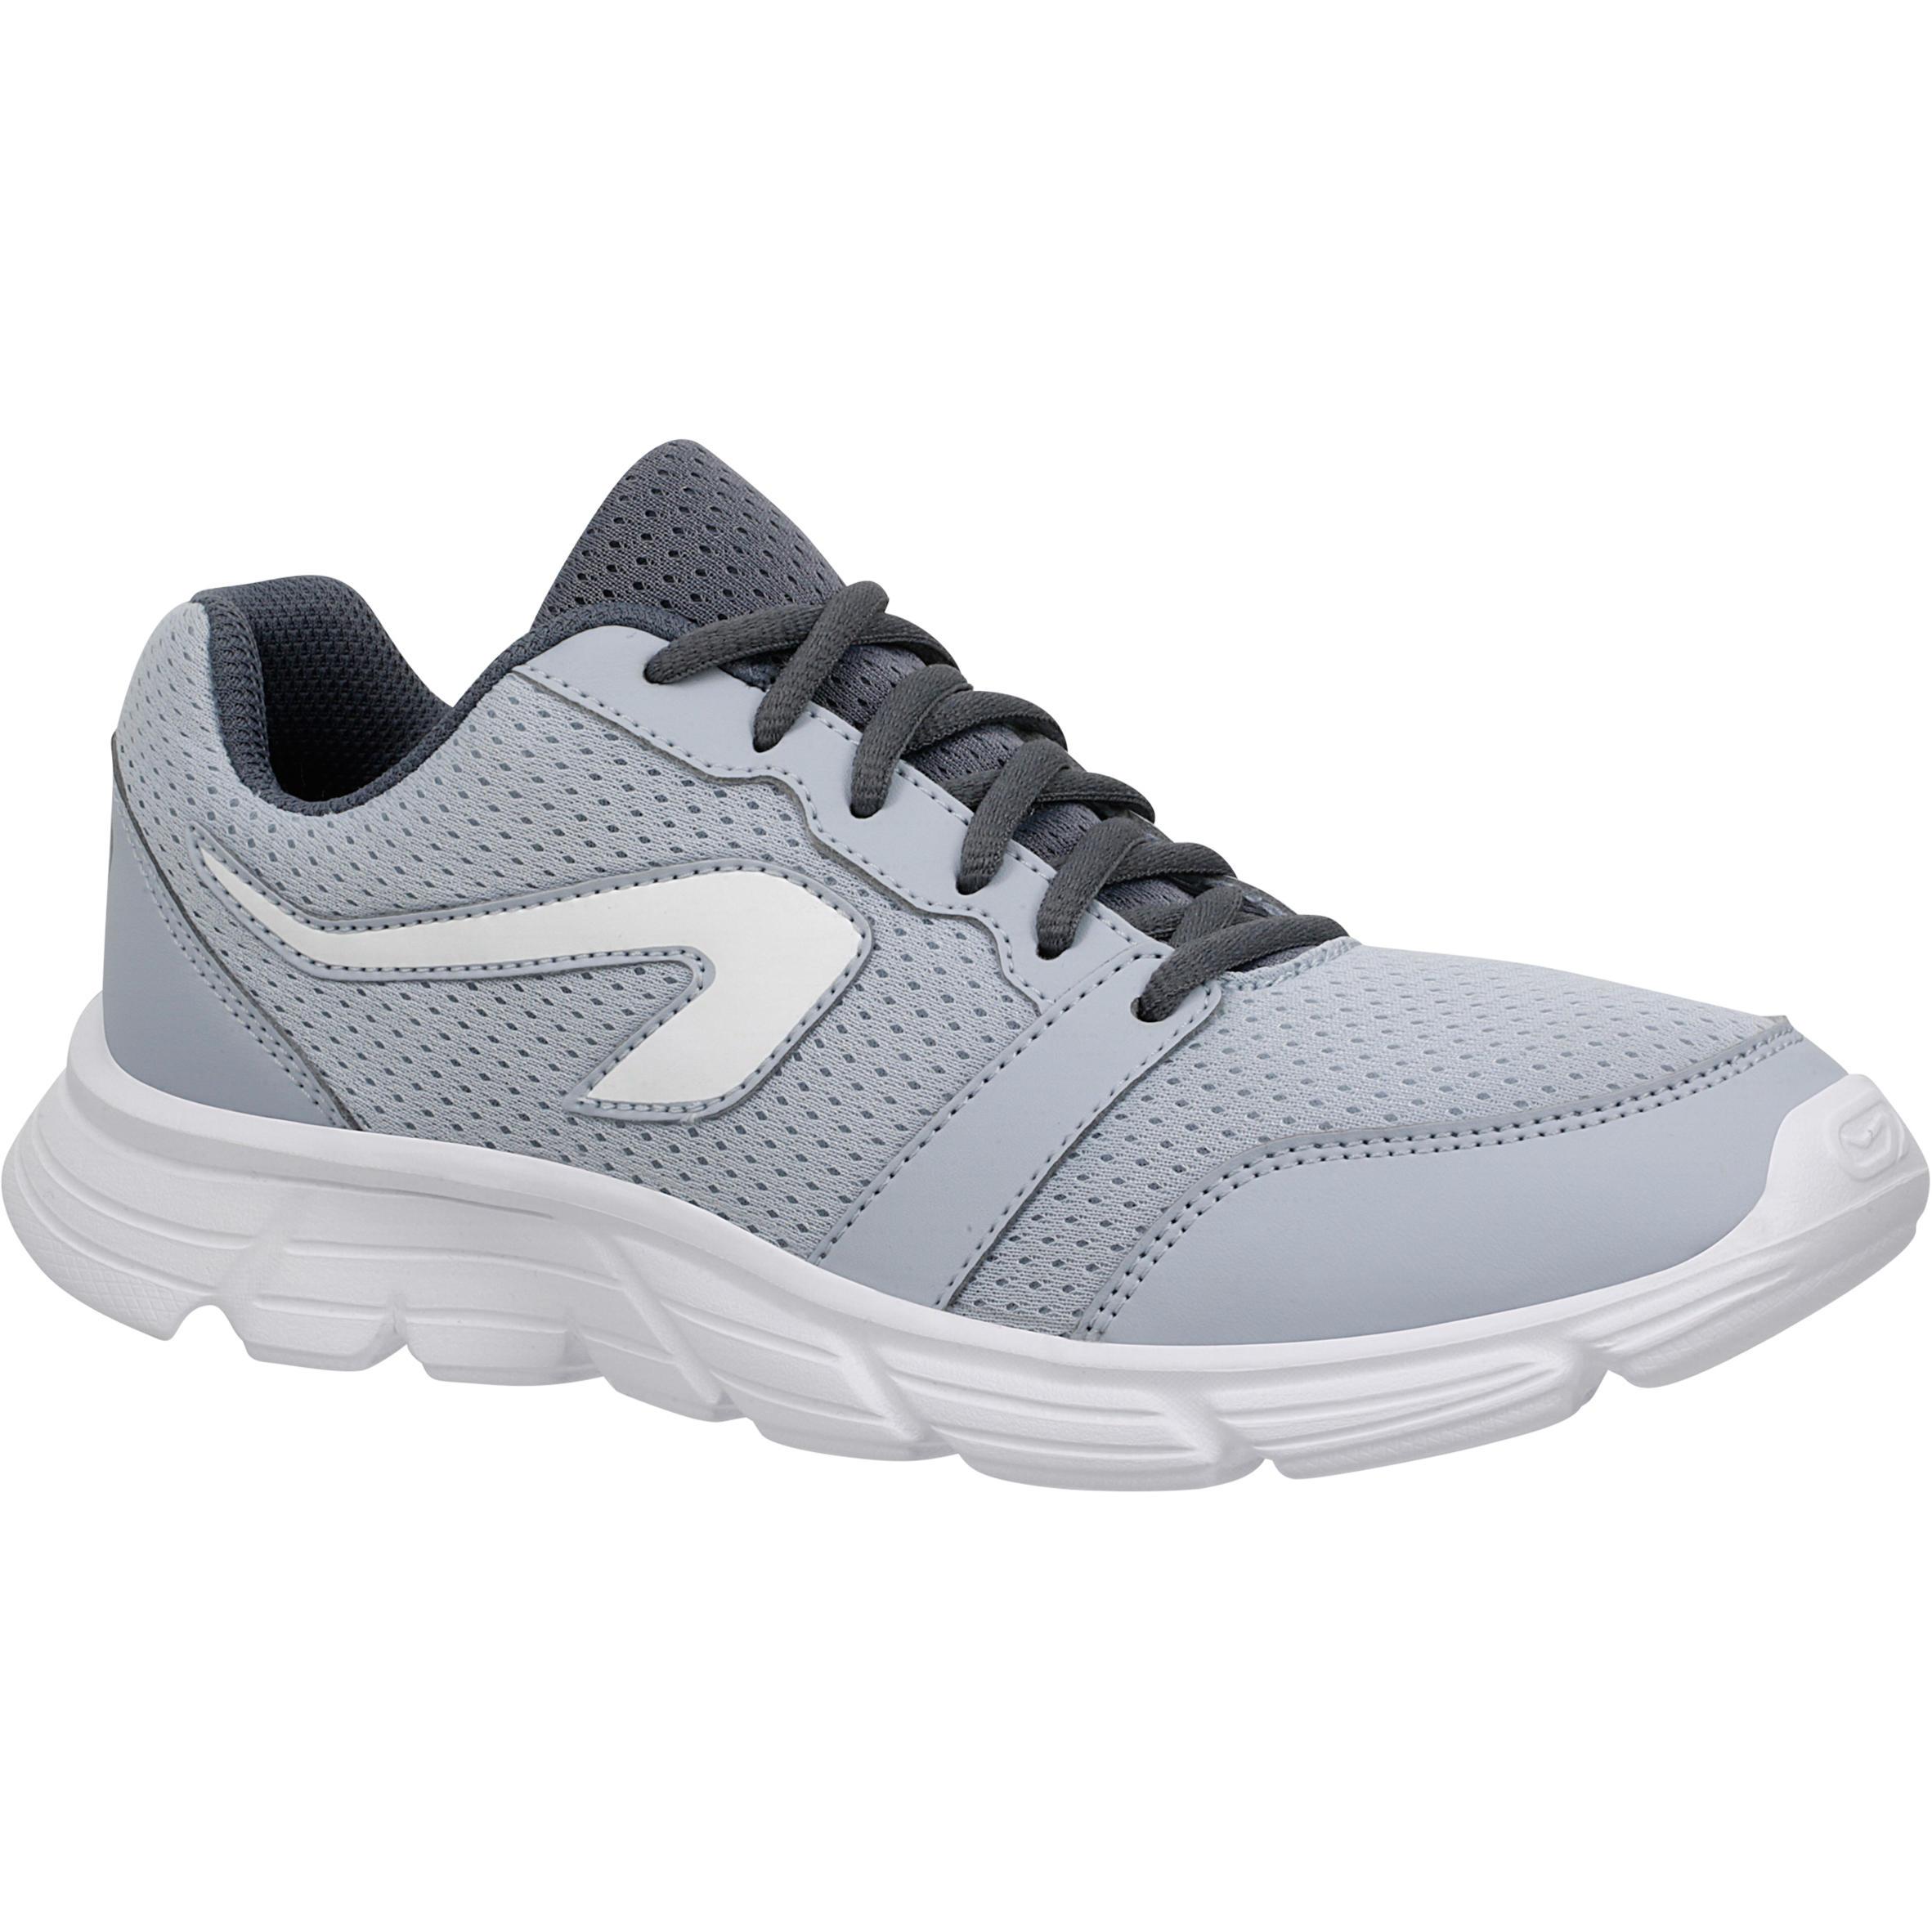 Laufschuhe Damen Run One | Schuhe > Sportschuhe > Laufschuhe | Kalenji